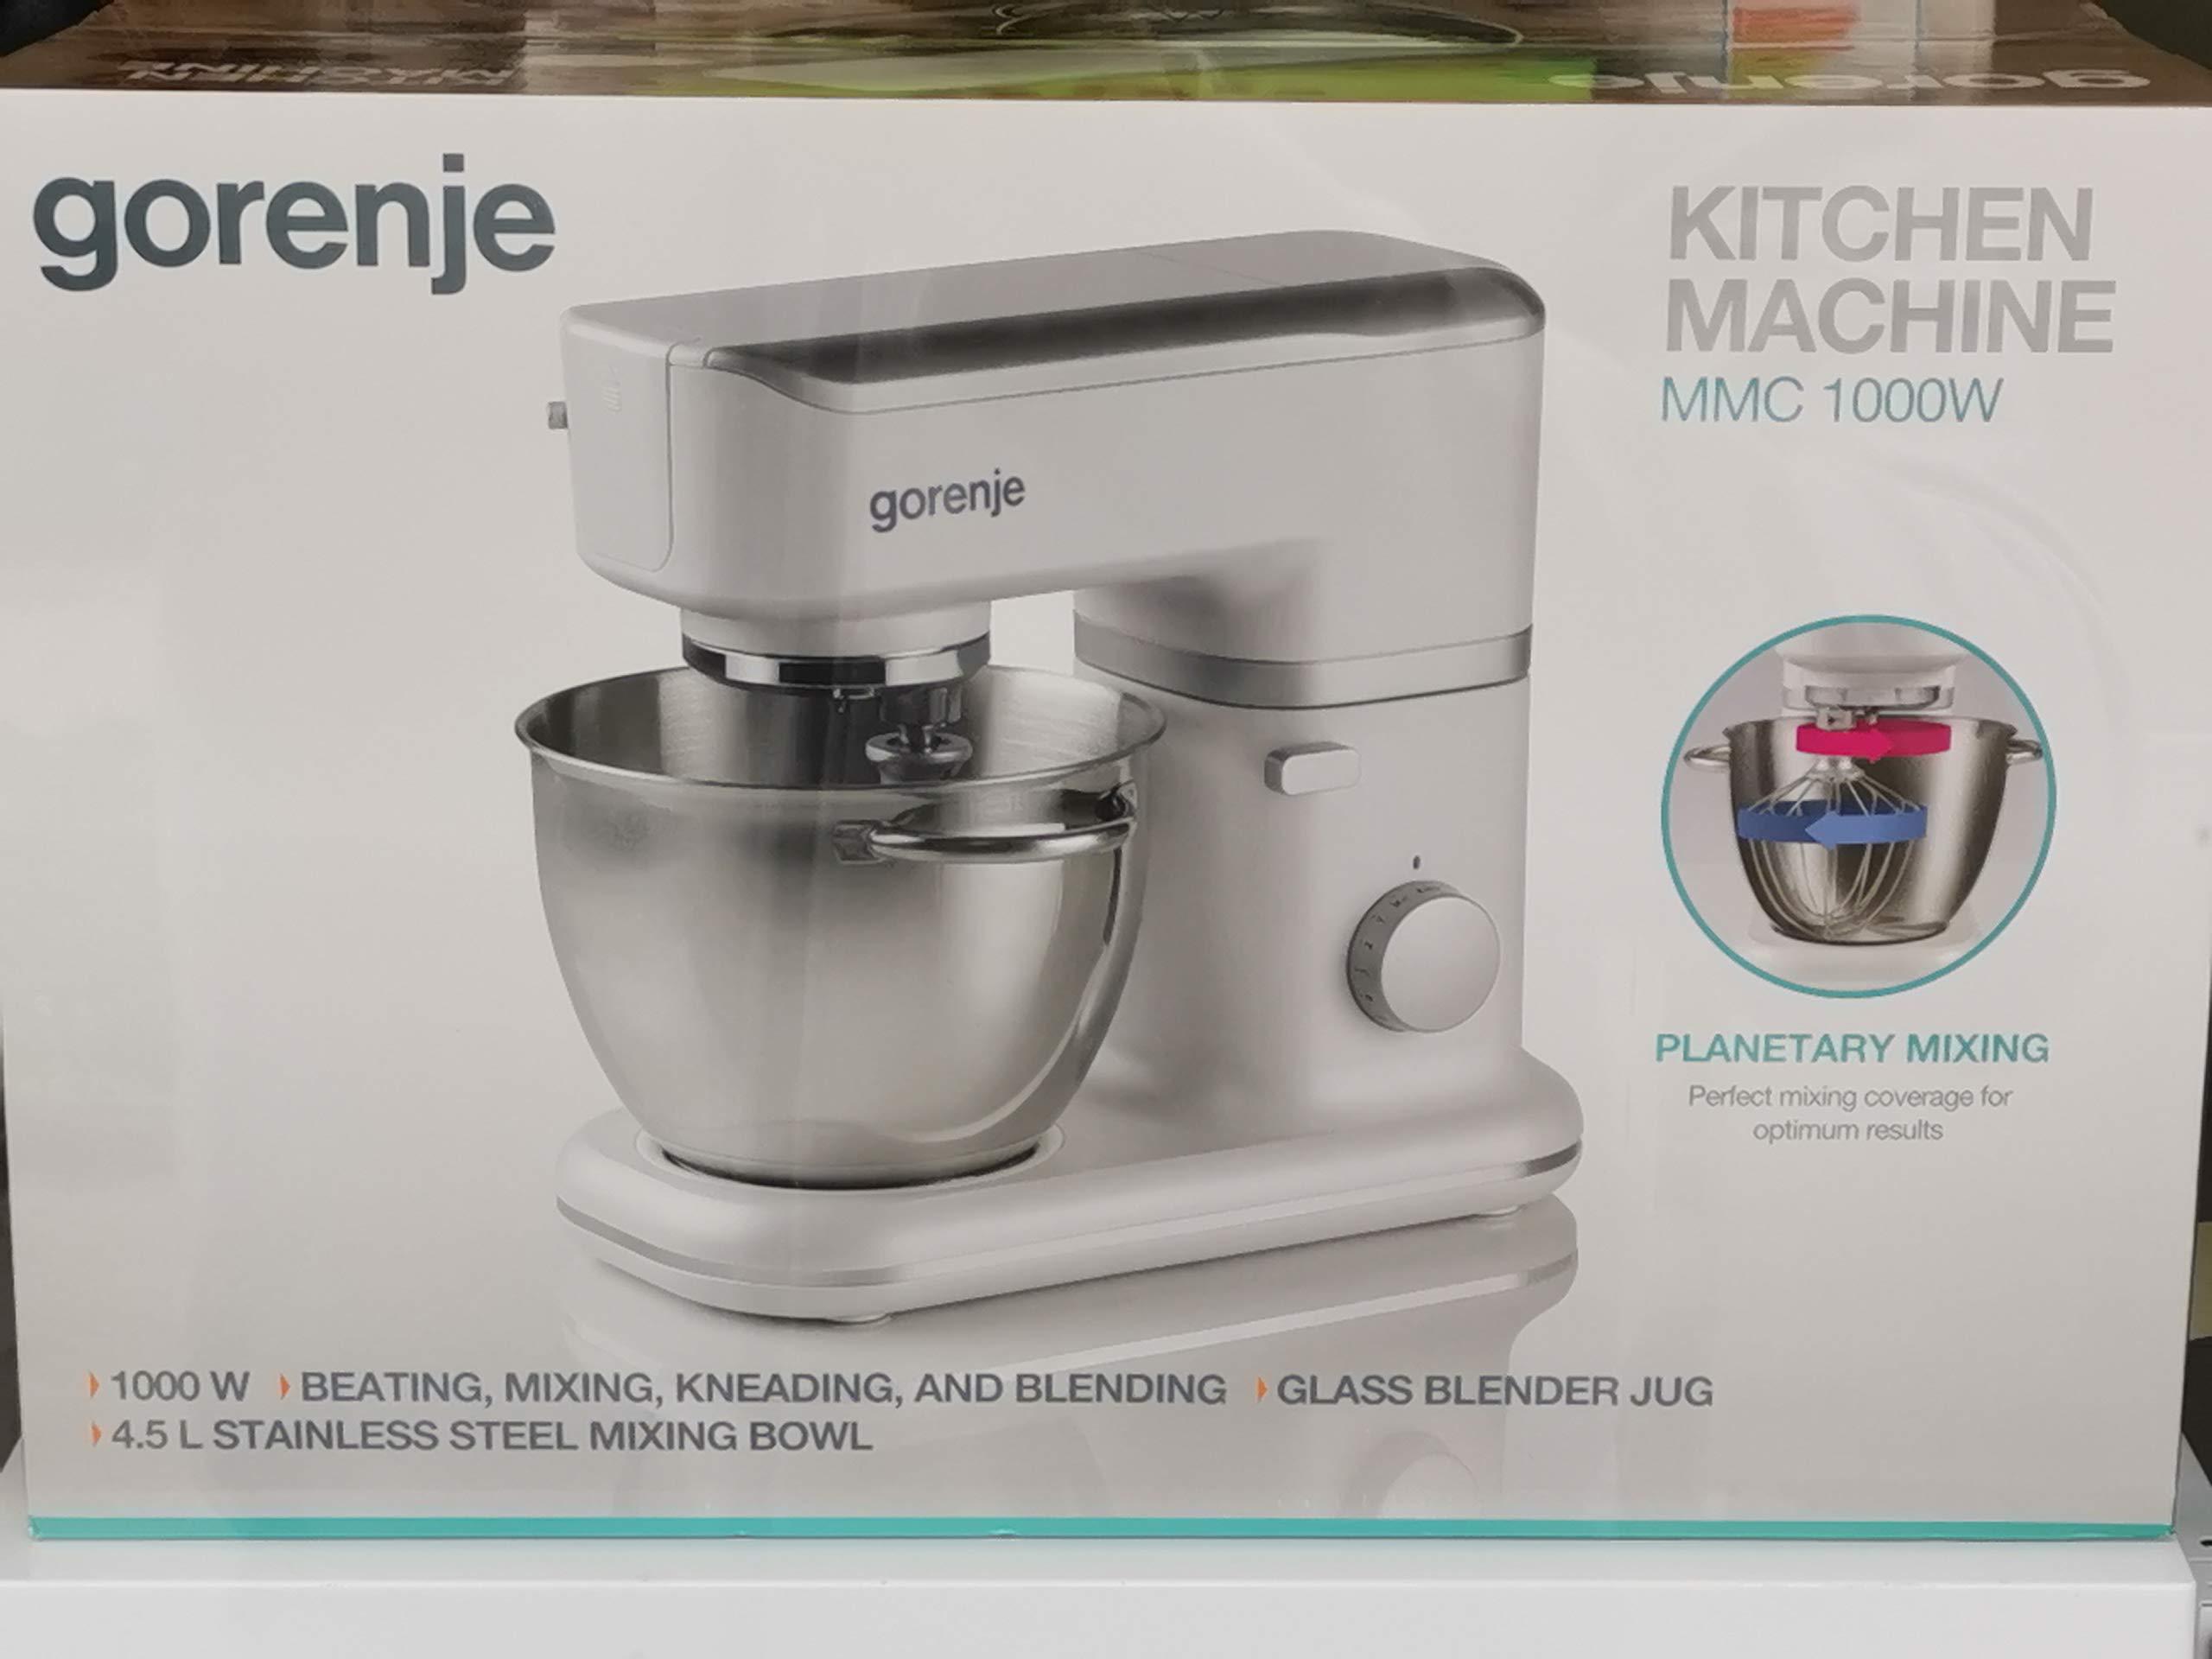 Gorenje MMC1000W 1000W 4.5L Blanco - Robot de cocina (4,5 L, Blanco, Giratorio, 1 m, AC, Acero inoxidable): Amazon.es: Hogar